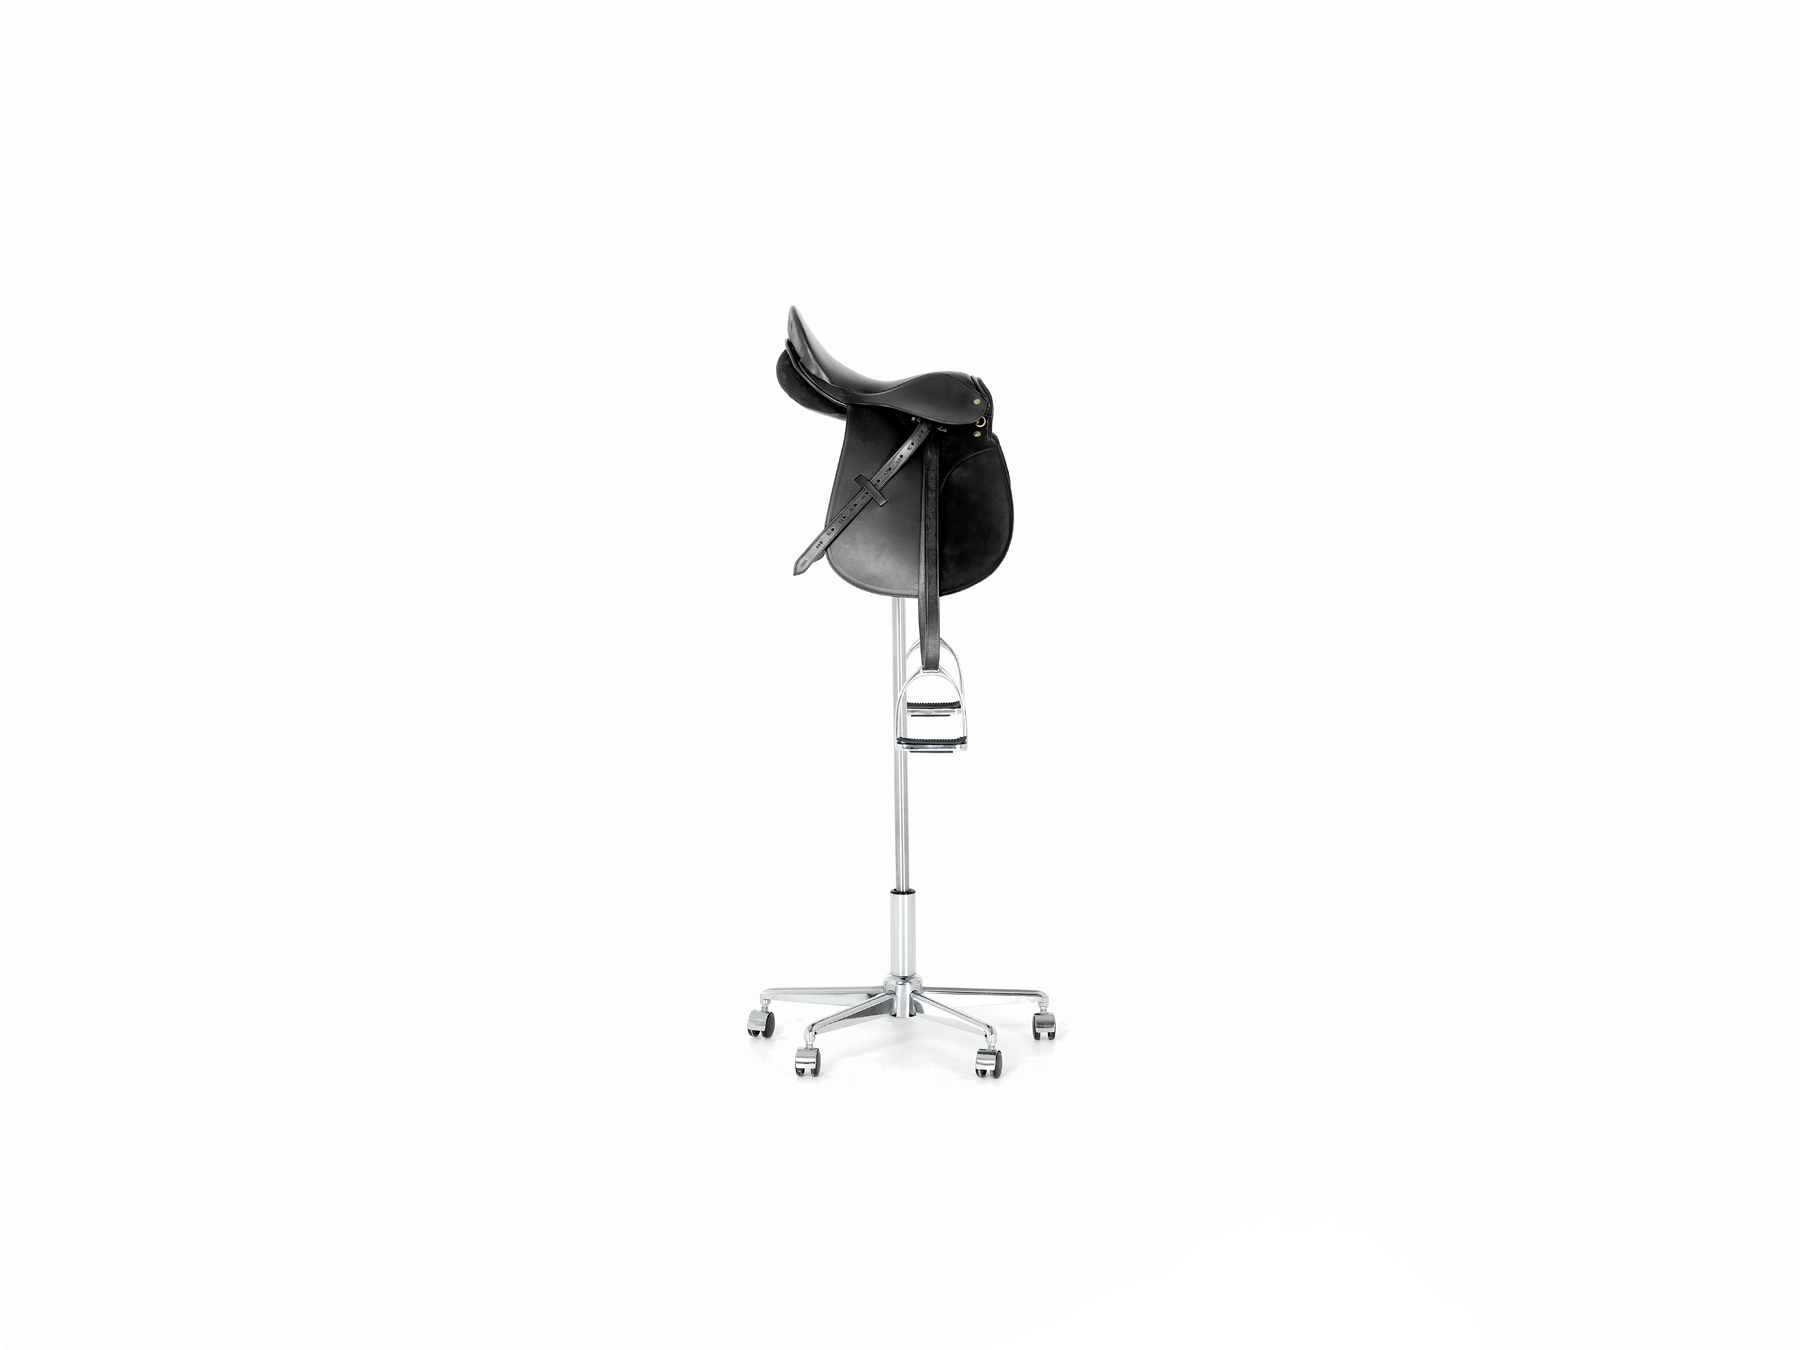 Bureau Crazy – High Chair